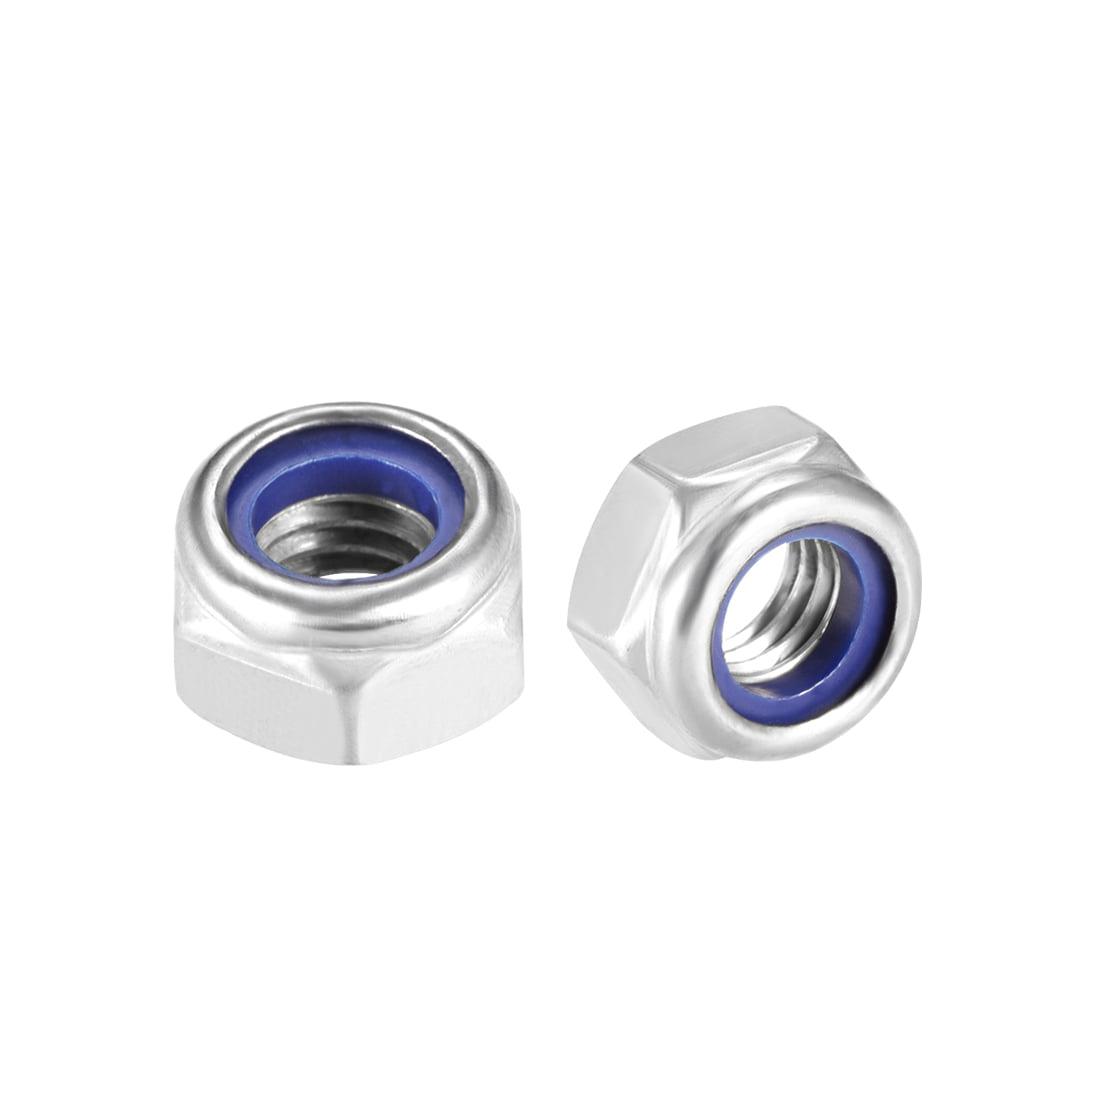 M8 x 1.25mm Nylon Insert Hex Lock Nuts, 316 Stainless Steel, Plain Finish, 4 Pcs - image 3 of 3